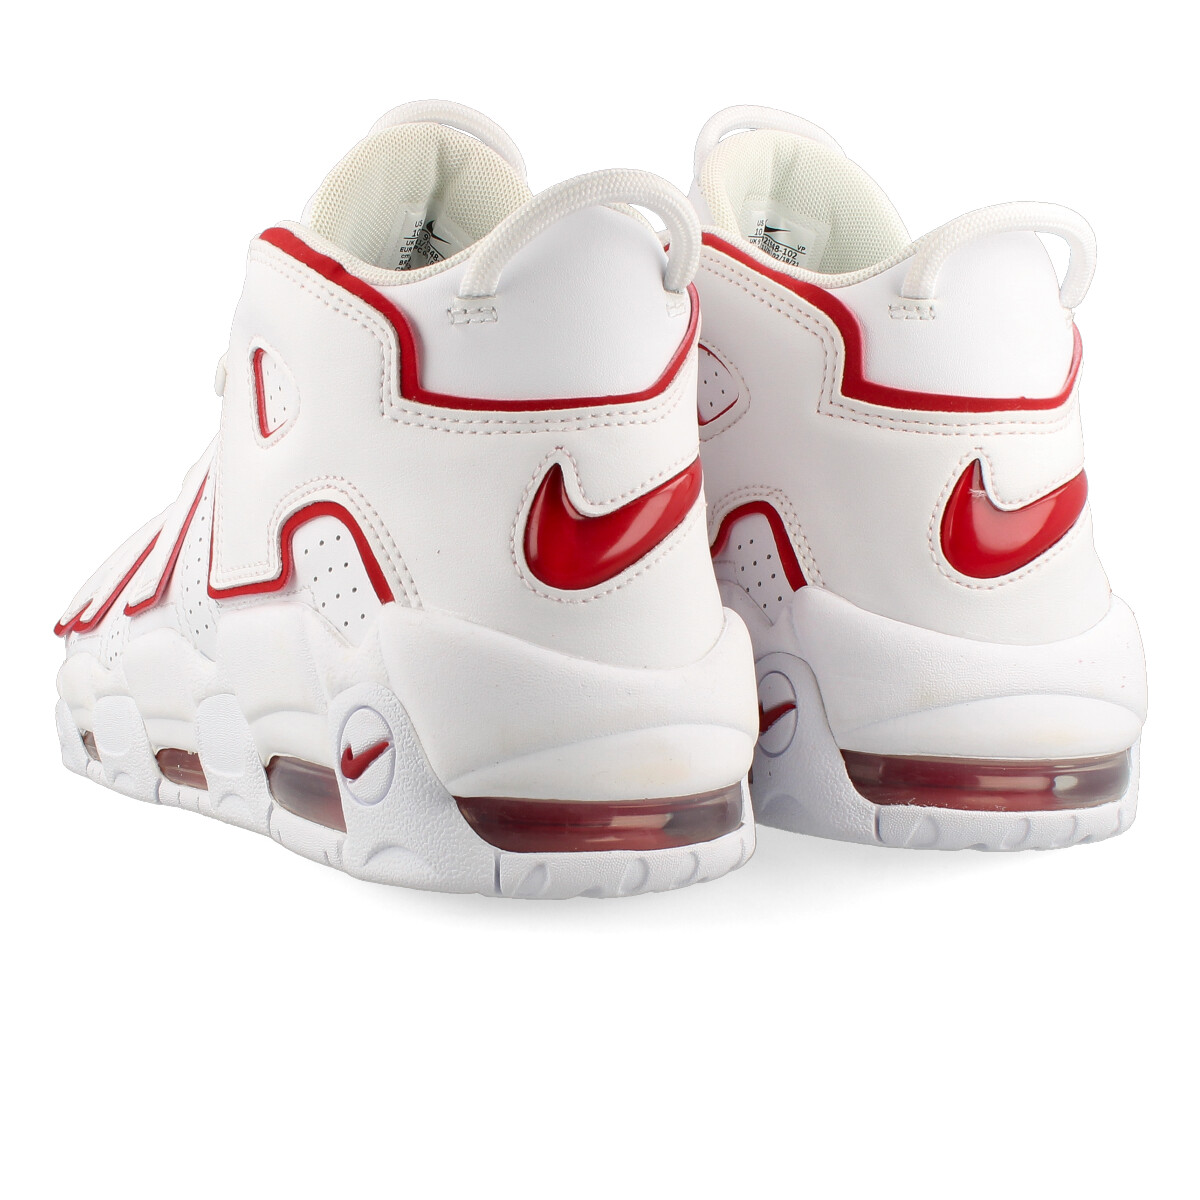 44ba8b29ec18 ... NIKE AIR MORE UPTEMPO 96 Nike more up tempo 96 WHITE/VARSITY RED/WHITE  ...